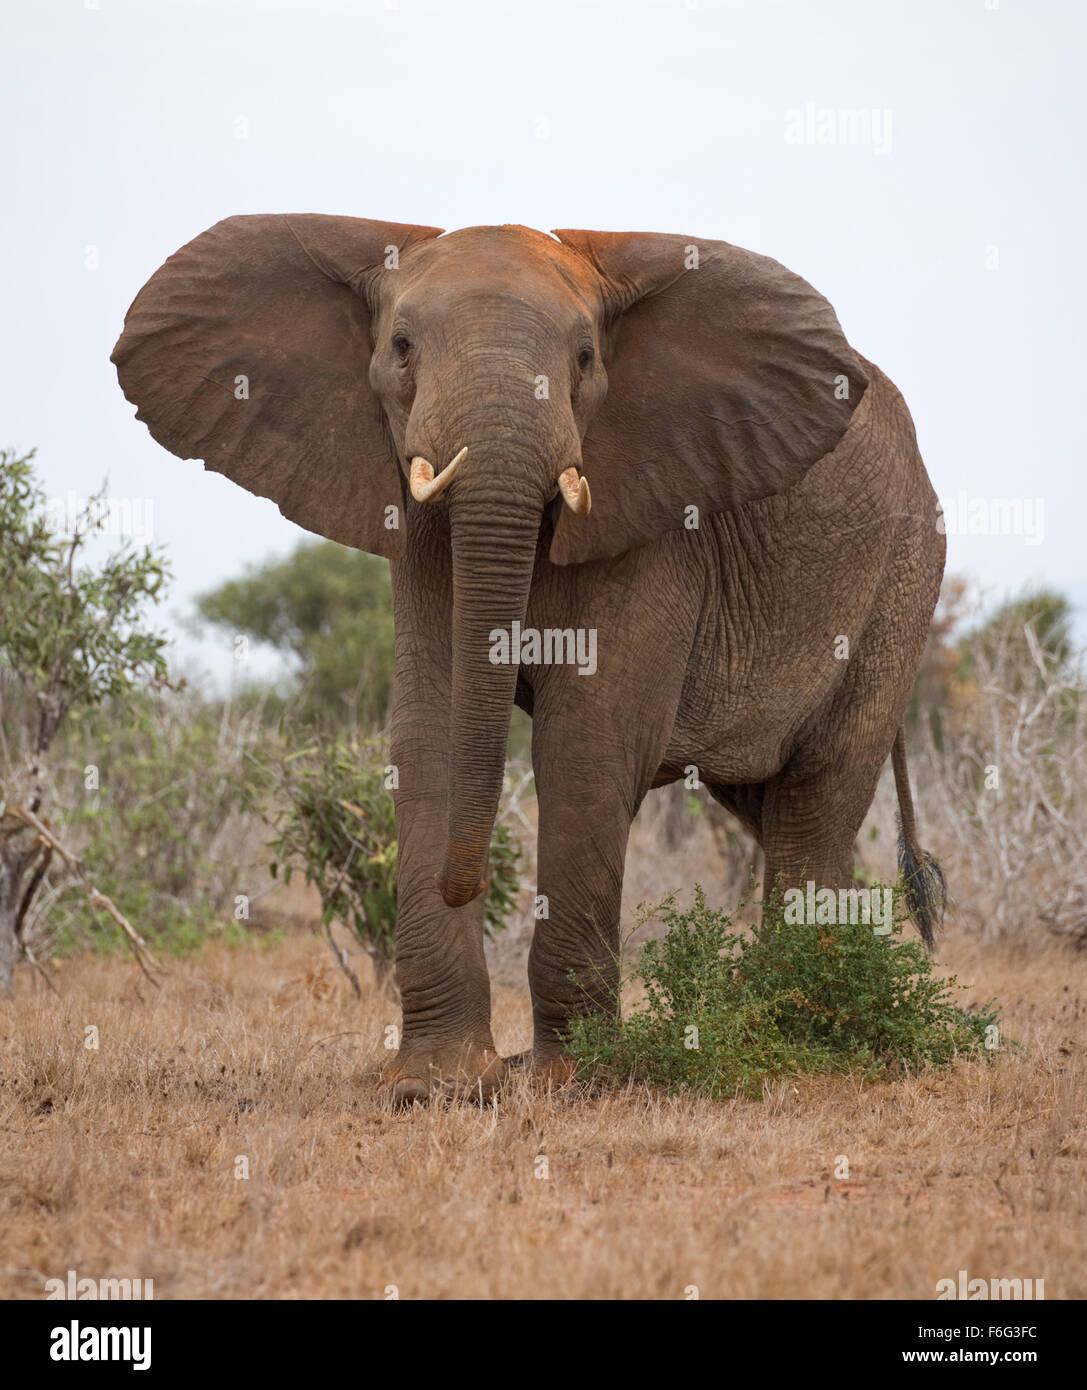 Elephant threatening ears flapping Loxodonta africana Tsavo East National Park Kenya - Stock Image